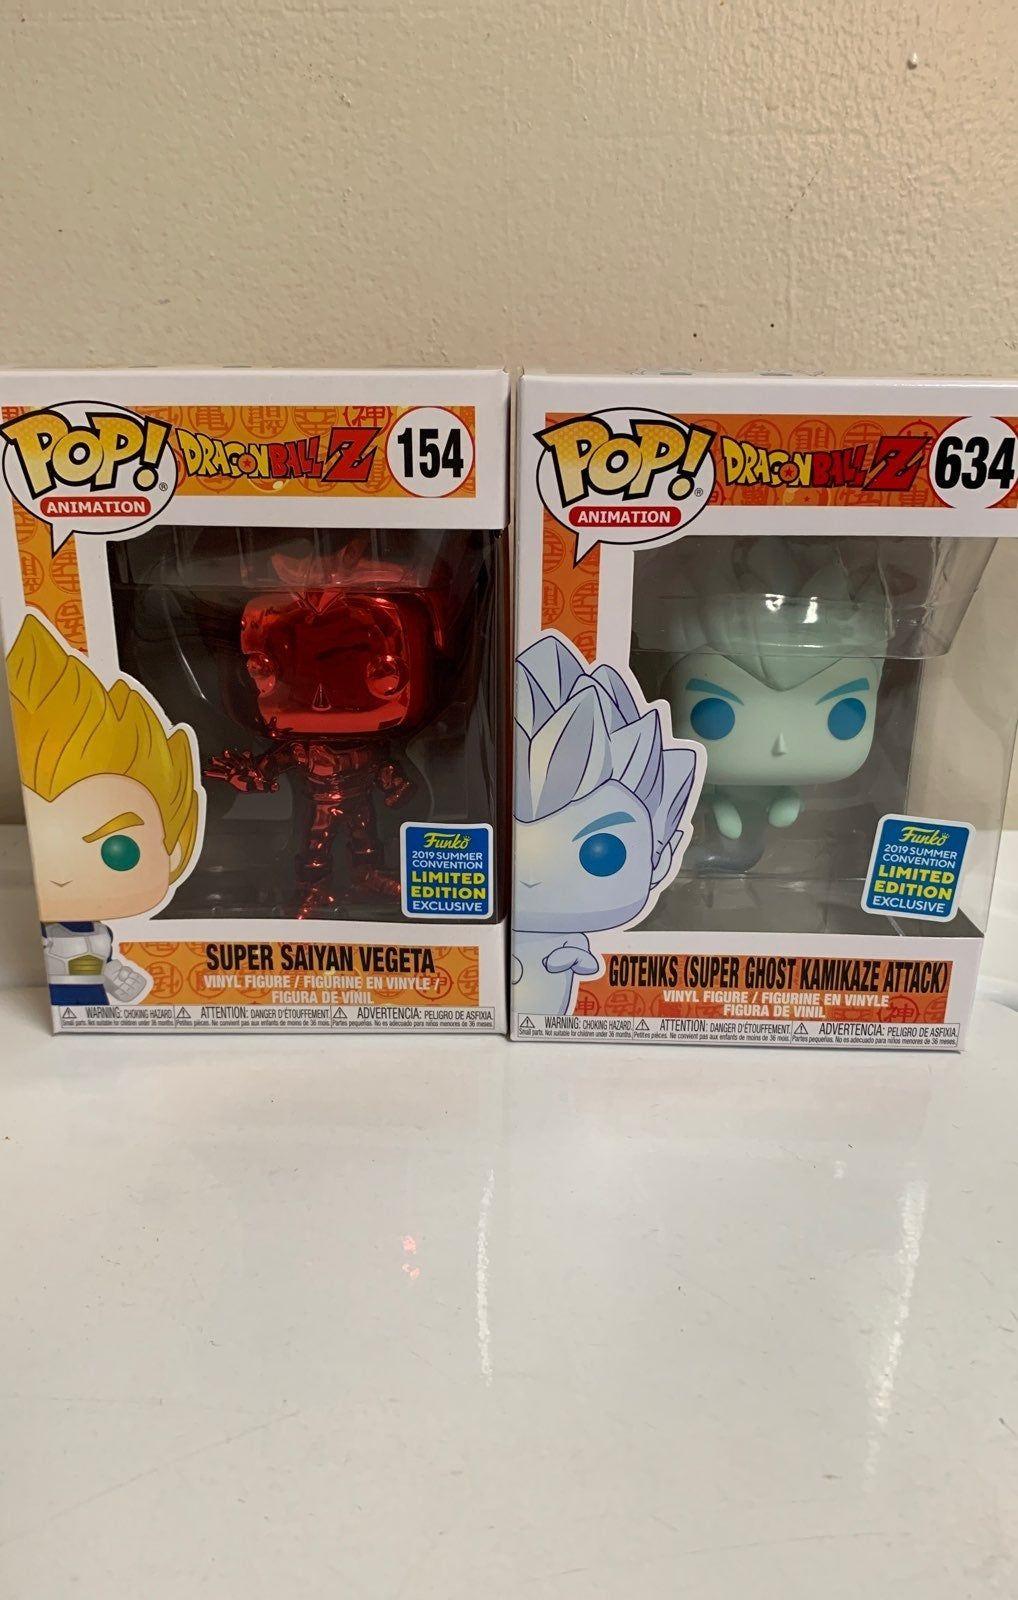 Sdcc Exclusive Funko Pop Bundle Dragon Ball Gotenks Ghost And Super Saiyan Vegeta Red Chrome Ready To Ship Sold Out Vinyl Figures Funko Super Saiyan Vegeta